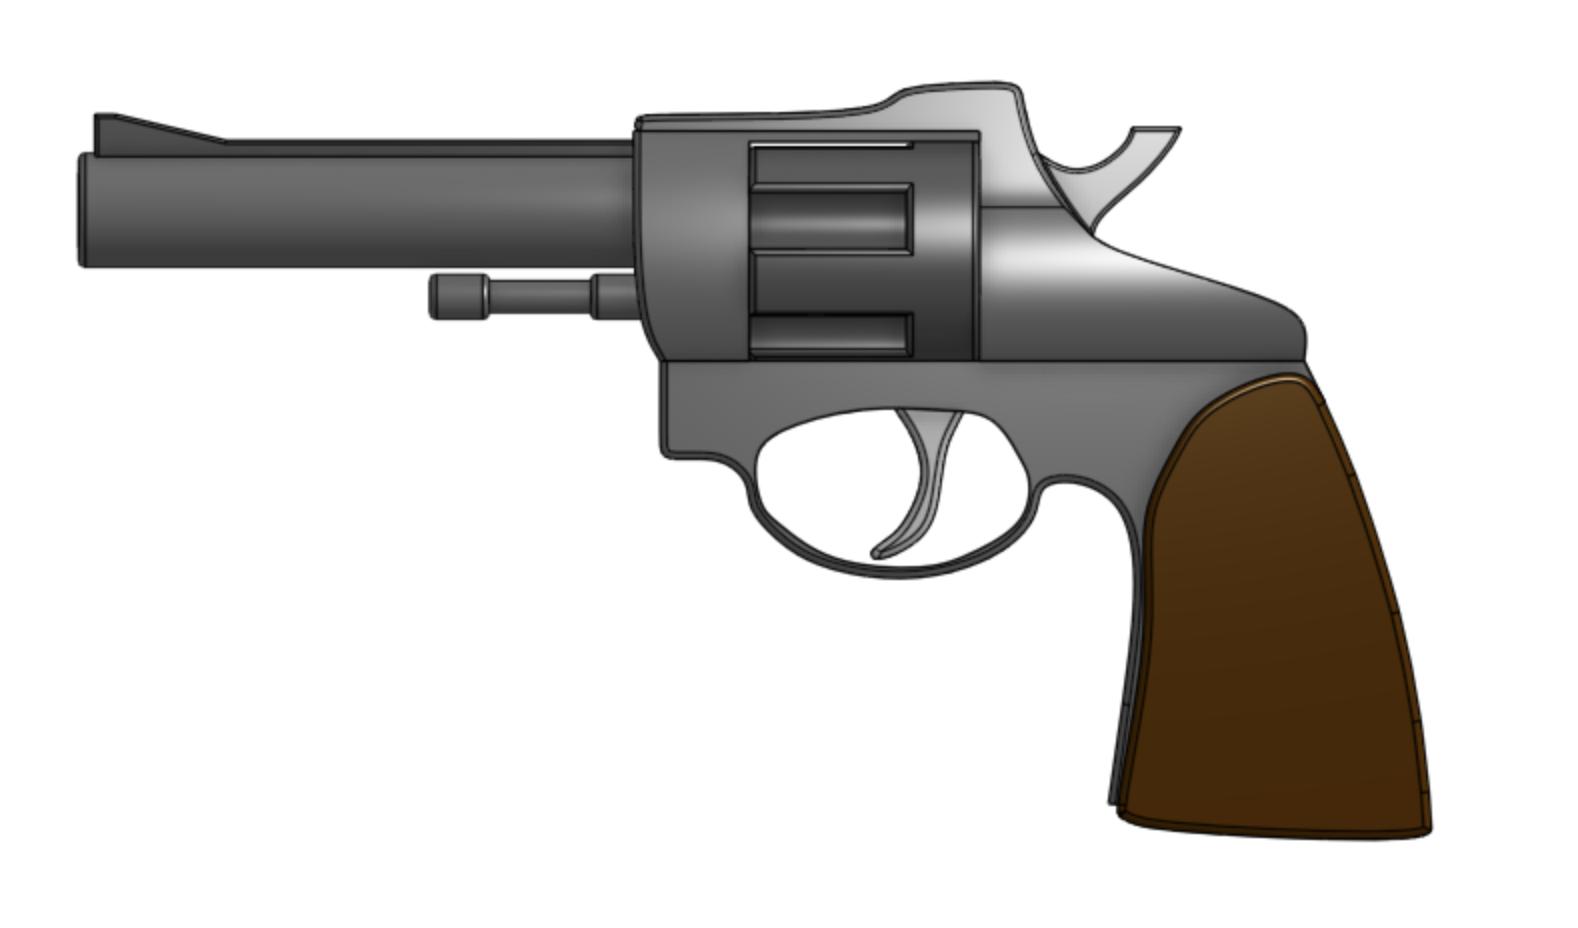 Revolver Pistol Thing